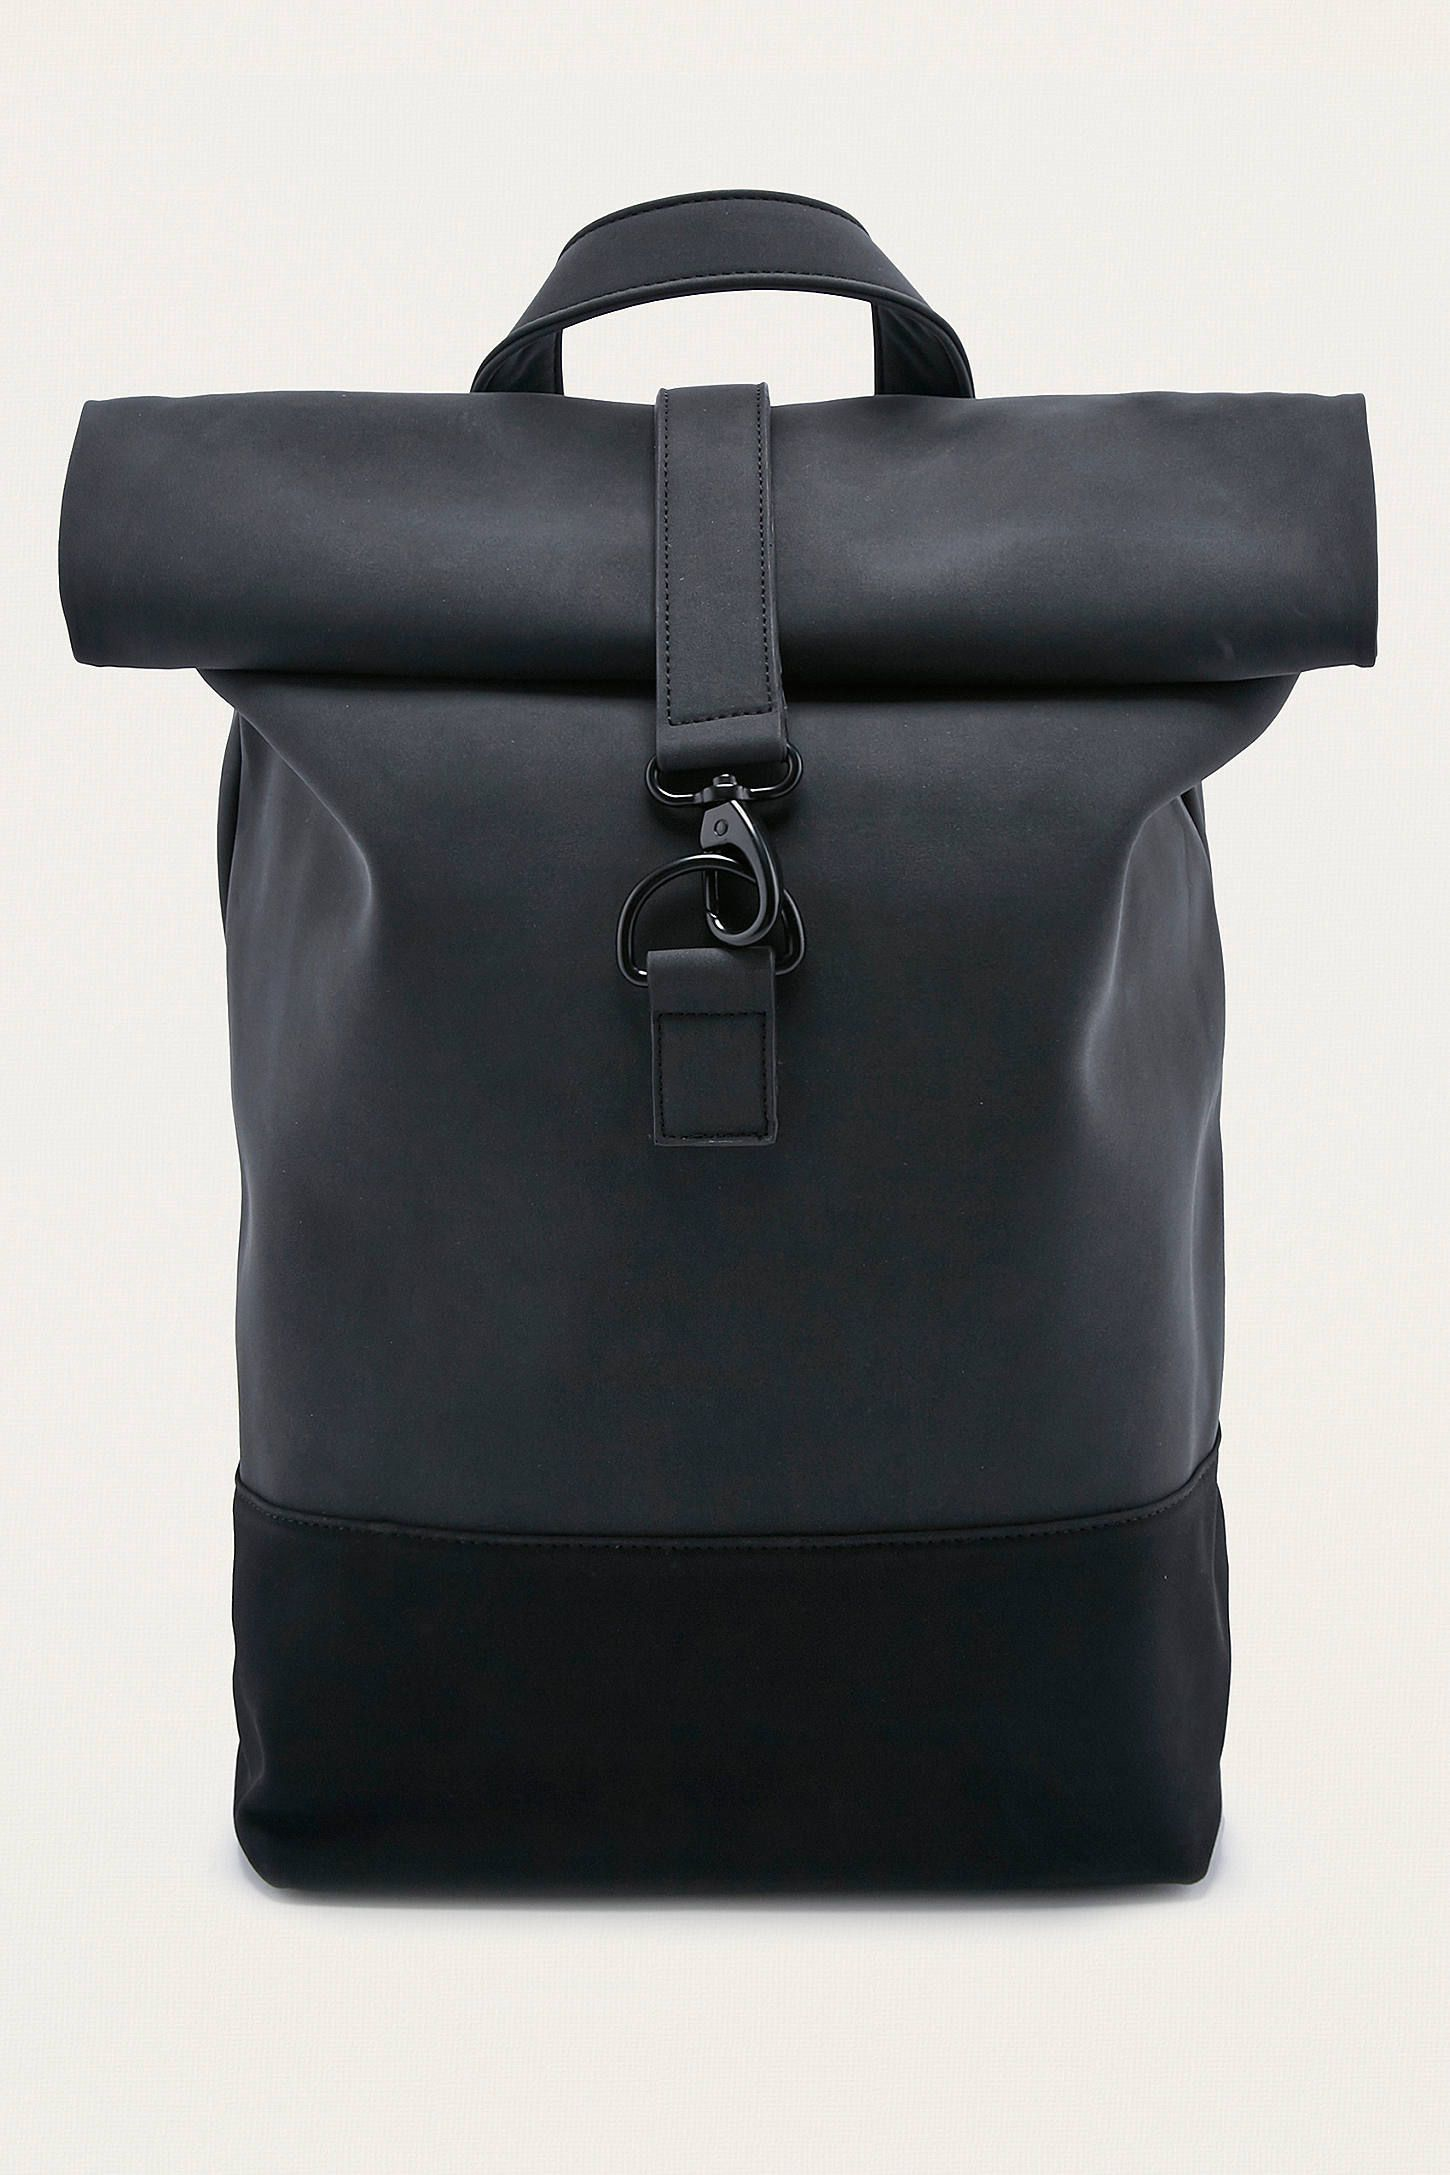 loom matte black rolltop backpack rucksack damen schwarz rucksack m nner und rucksack herren. Black Bedroom Furniture Sets. Home Design Ideas